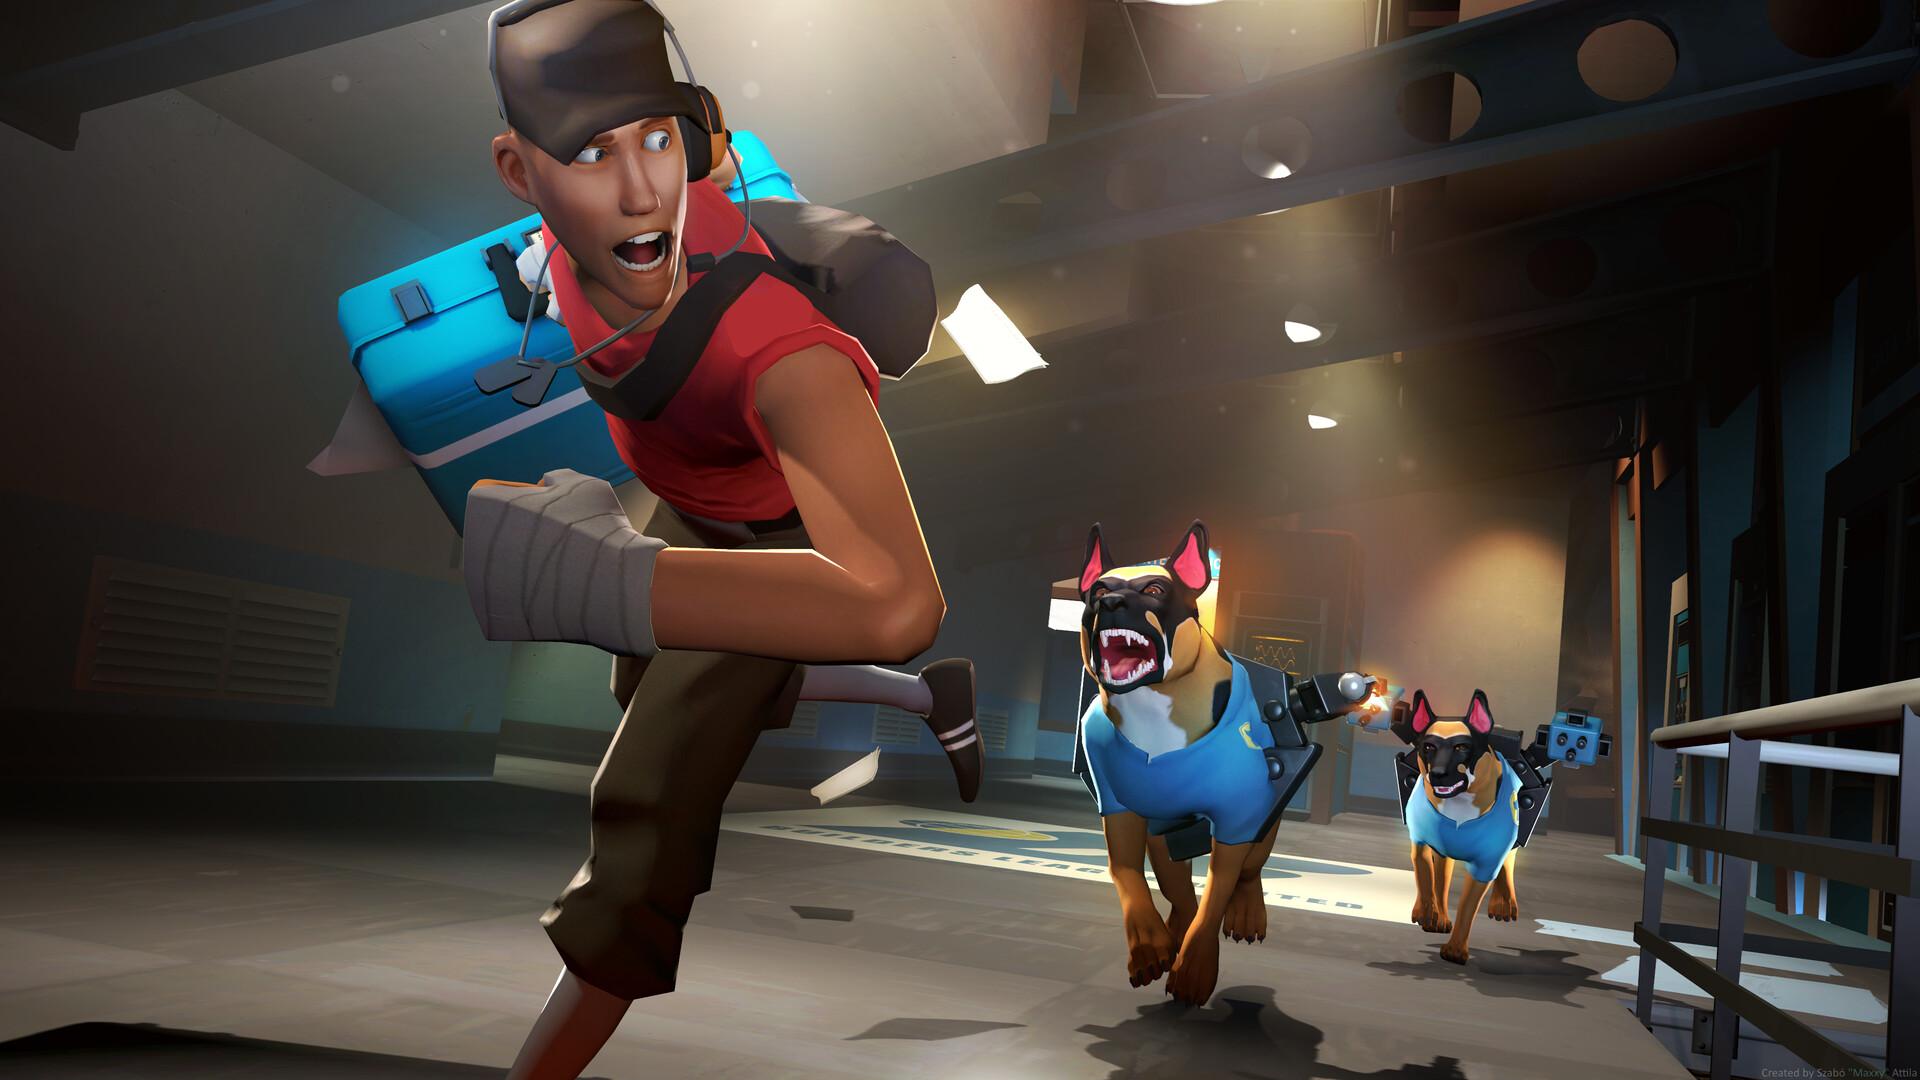 "3D Sfm Videos artstation - the guard dog tf2, szabó ""maxxy"" attila"